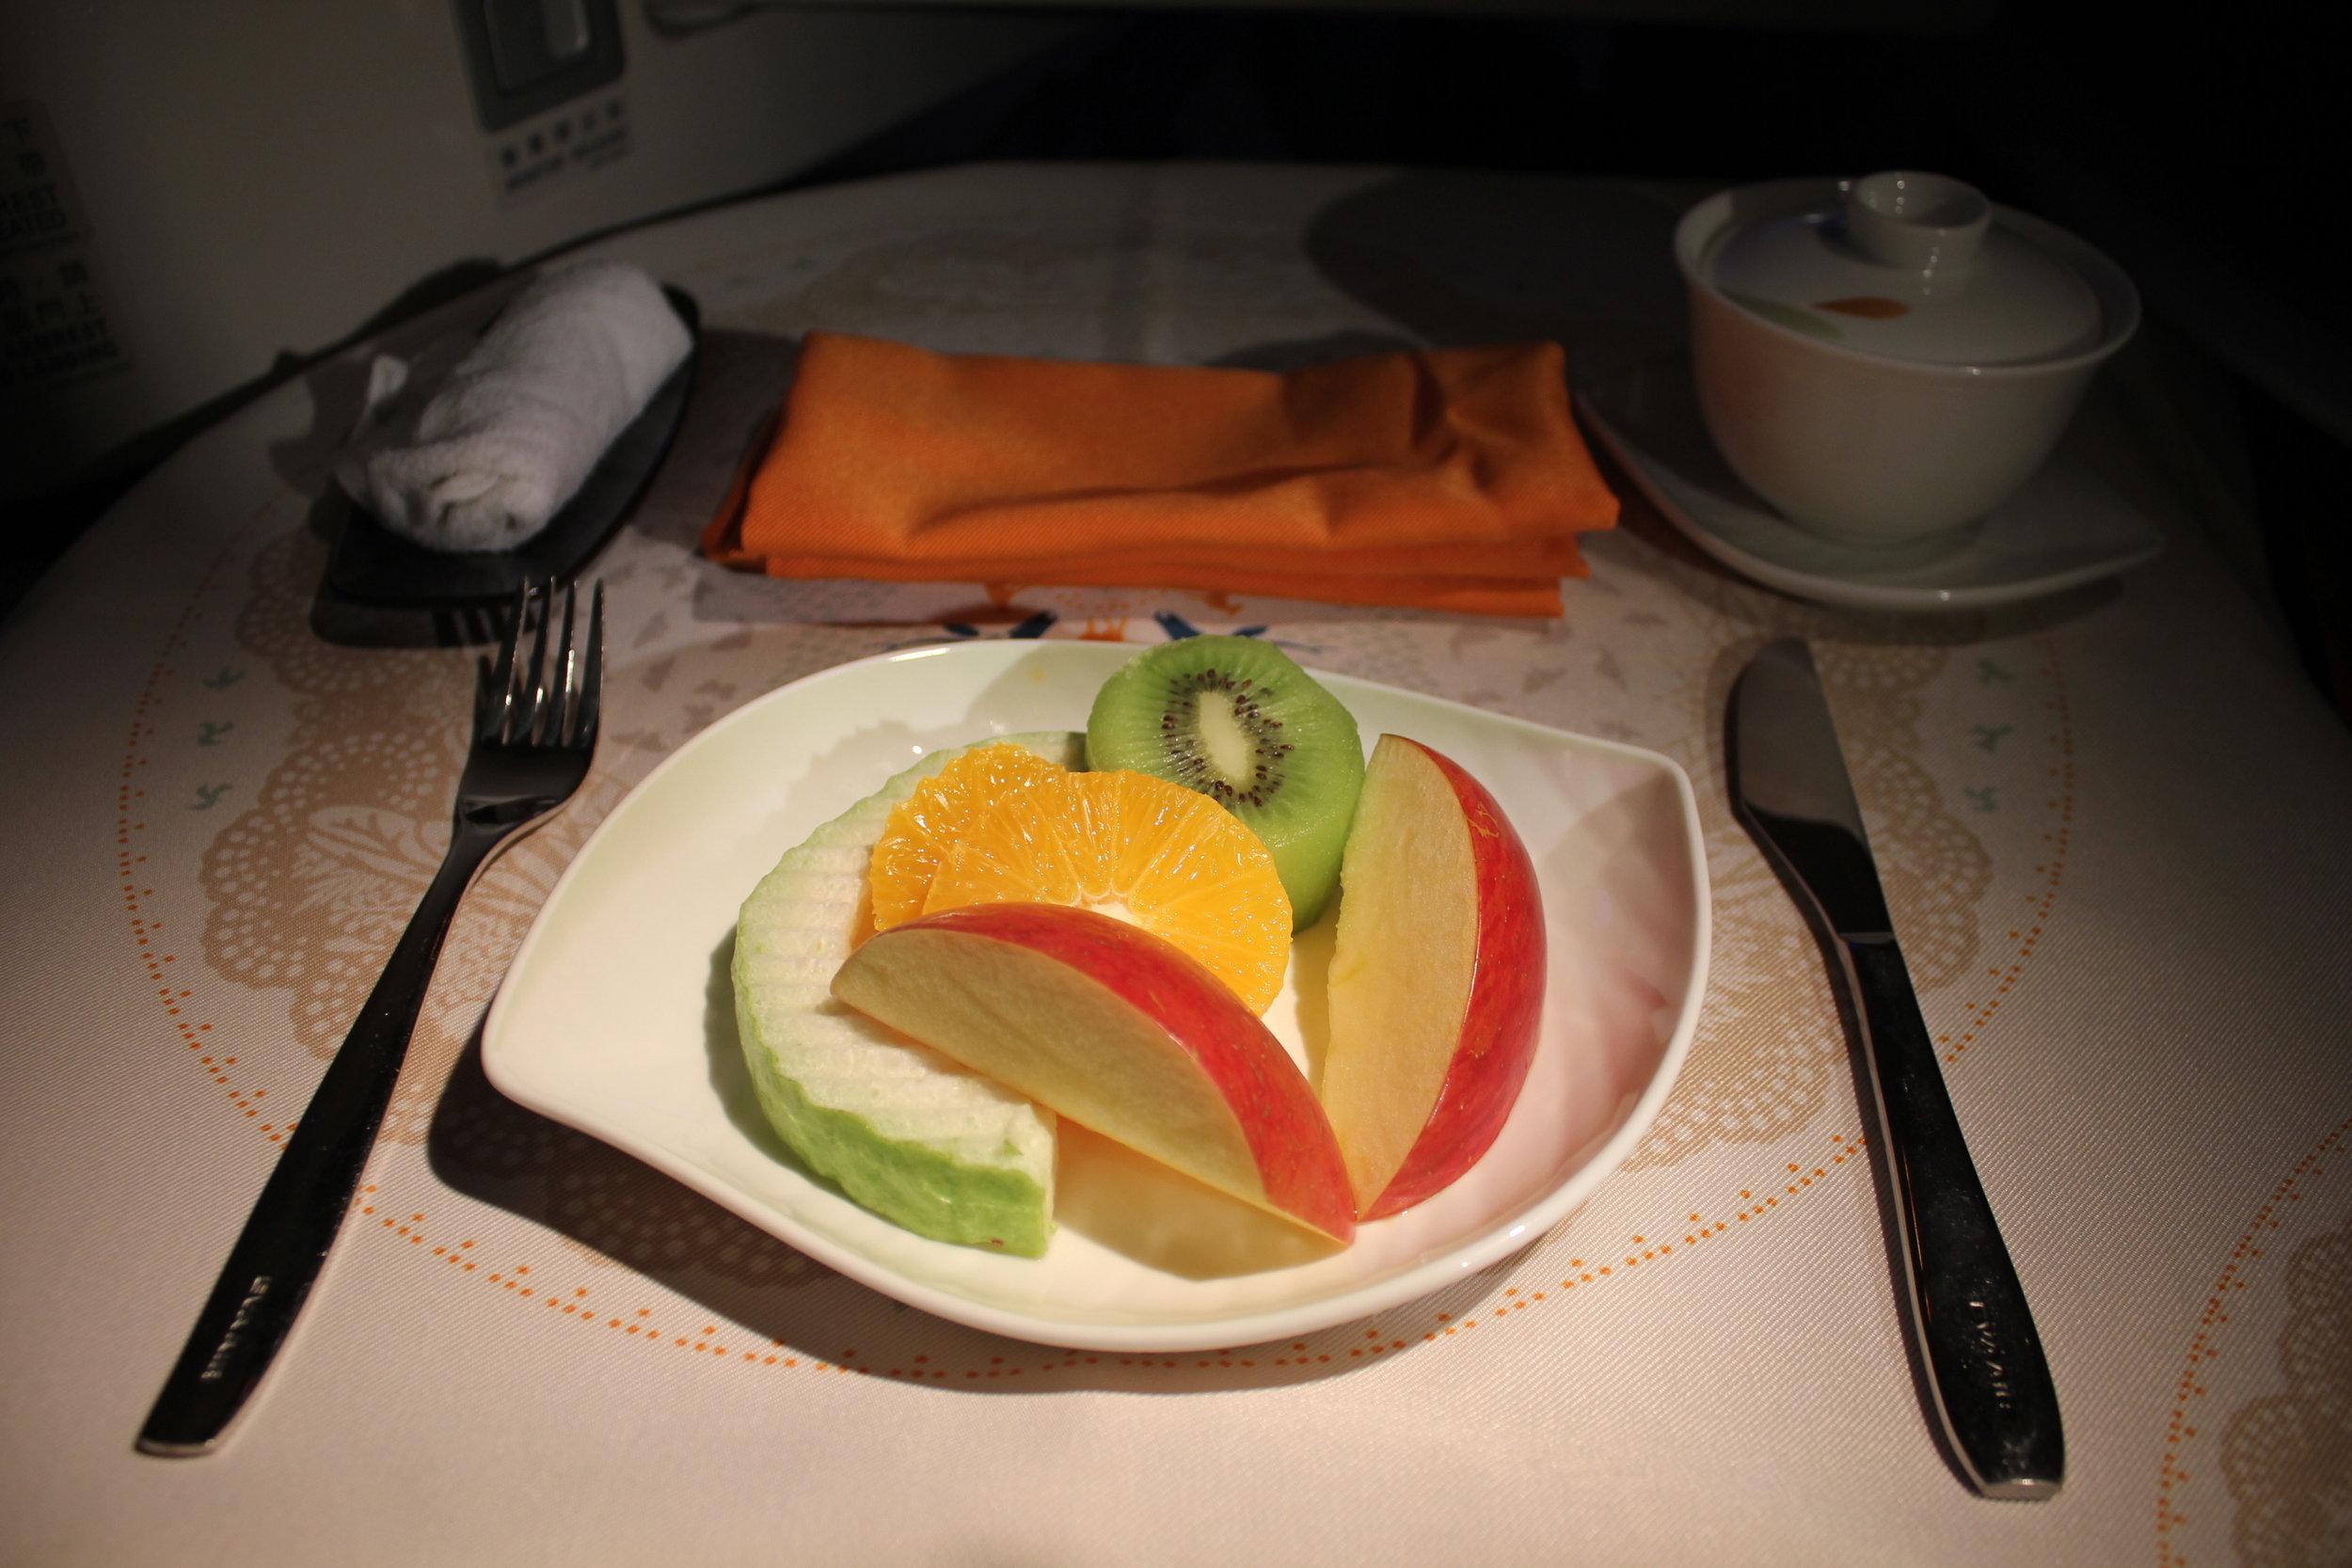 EVA Air business class – Fruit plate